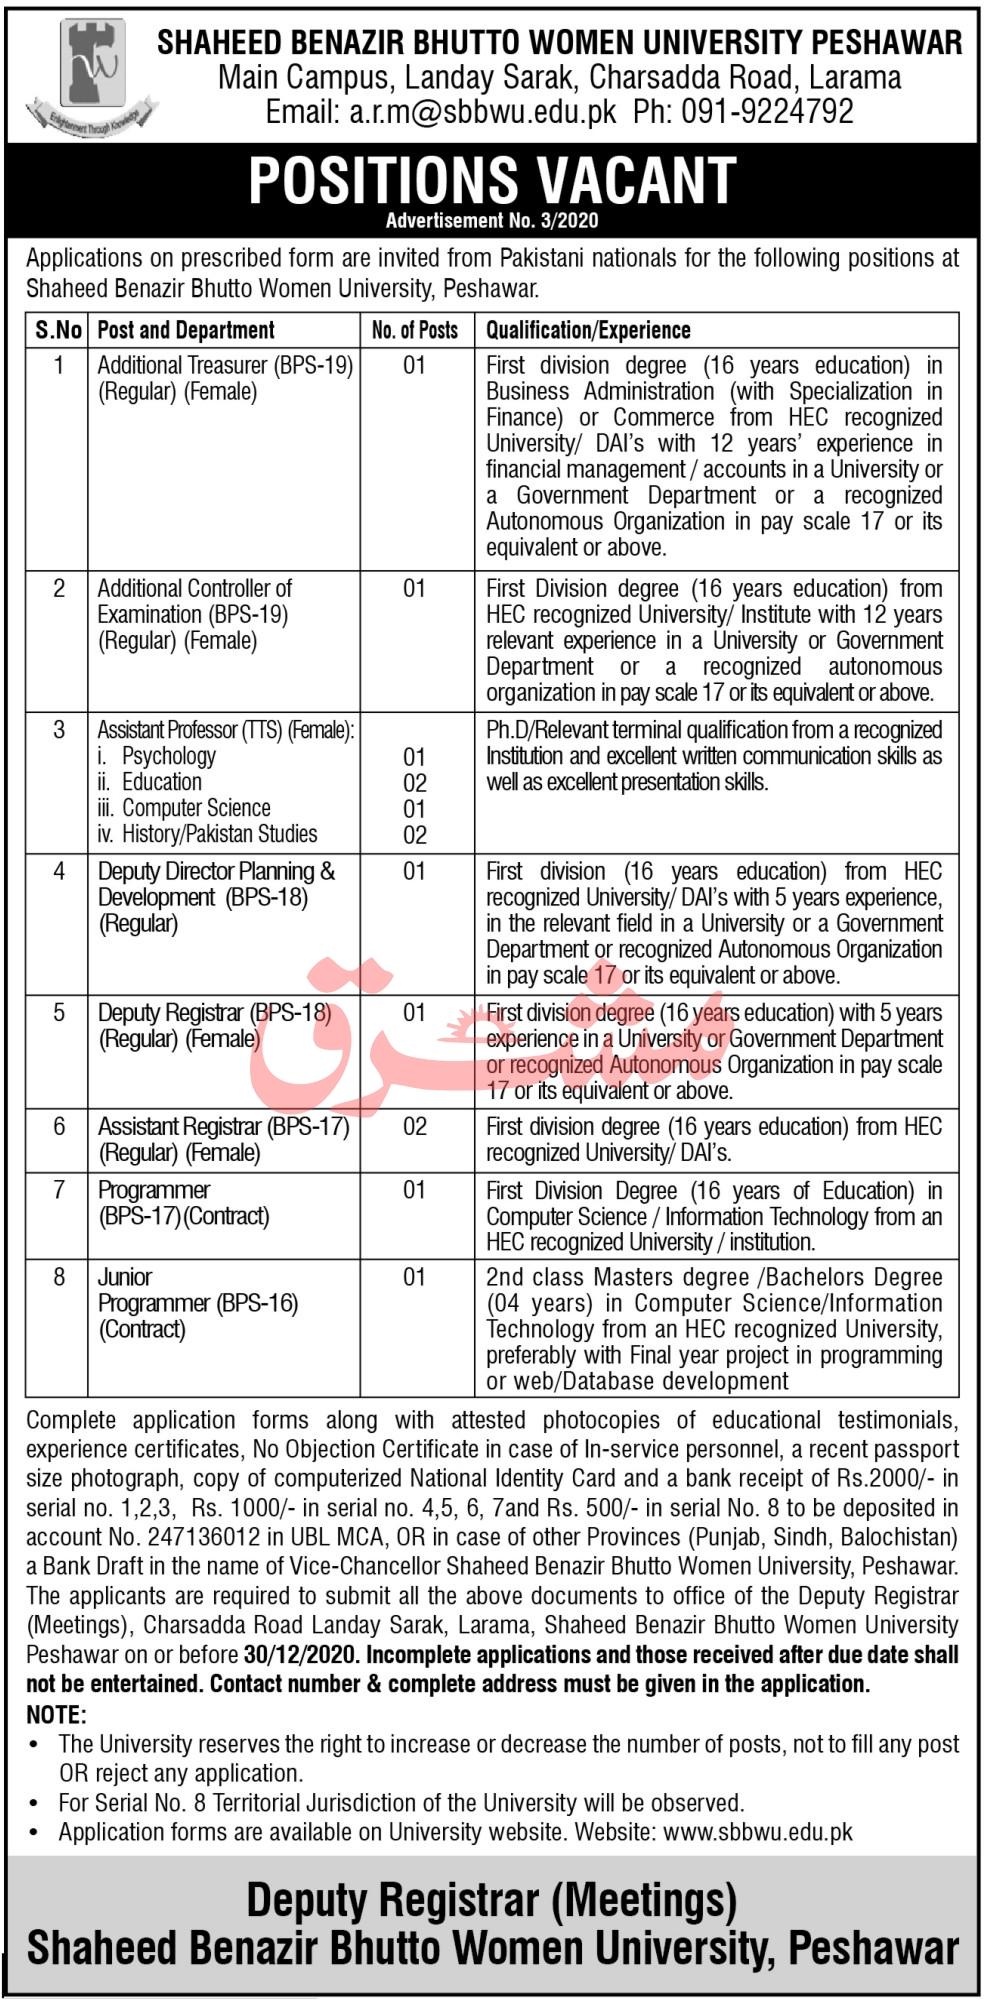 Shaheed Benazir Bhutto Women University SBBWU Benazir University Jobs in Pakistan - Download Job Application Form - www.sbbwu.edu.pk Jobs 2021